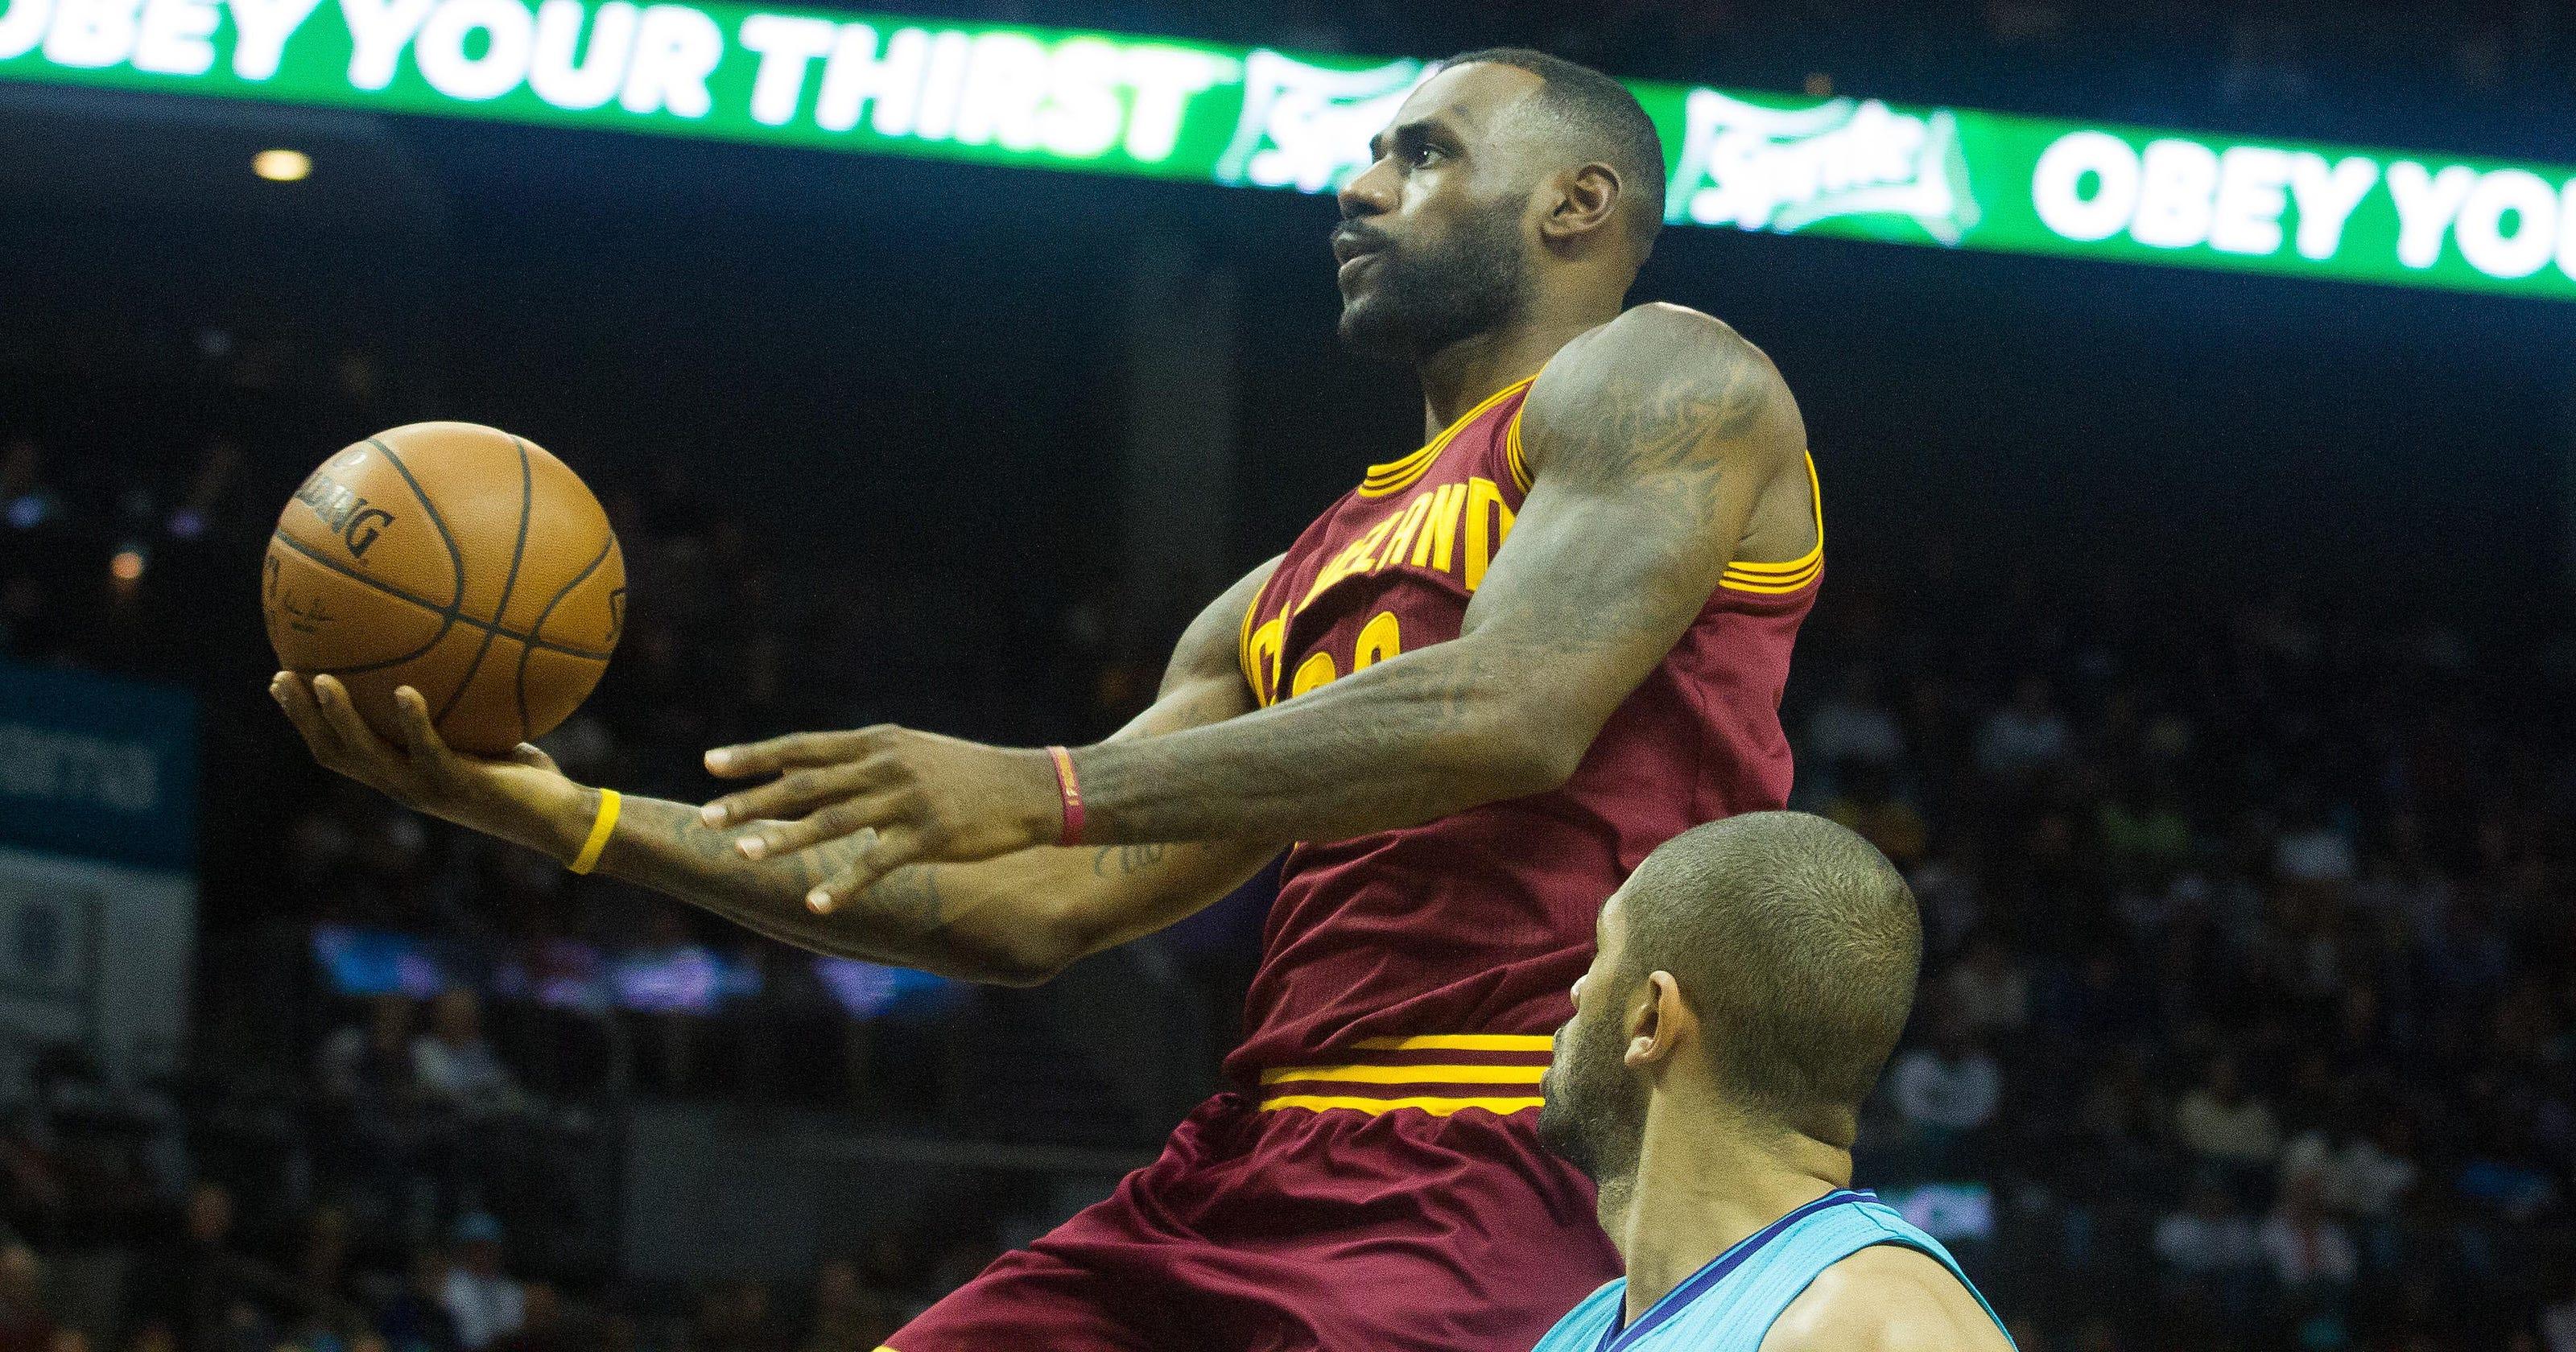 LeBron James scores 25 to lead Cavs over Hornets again 9e26a0d49